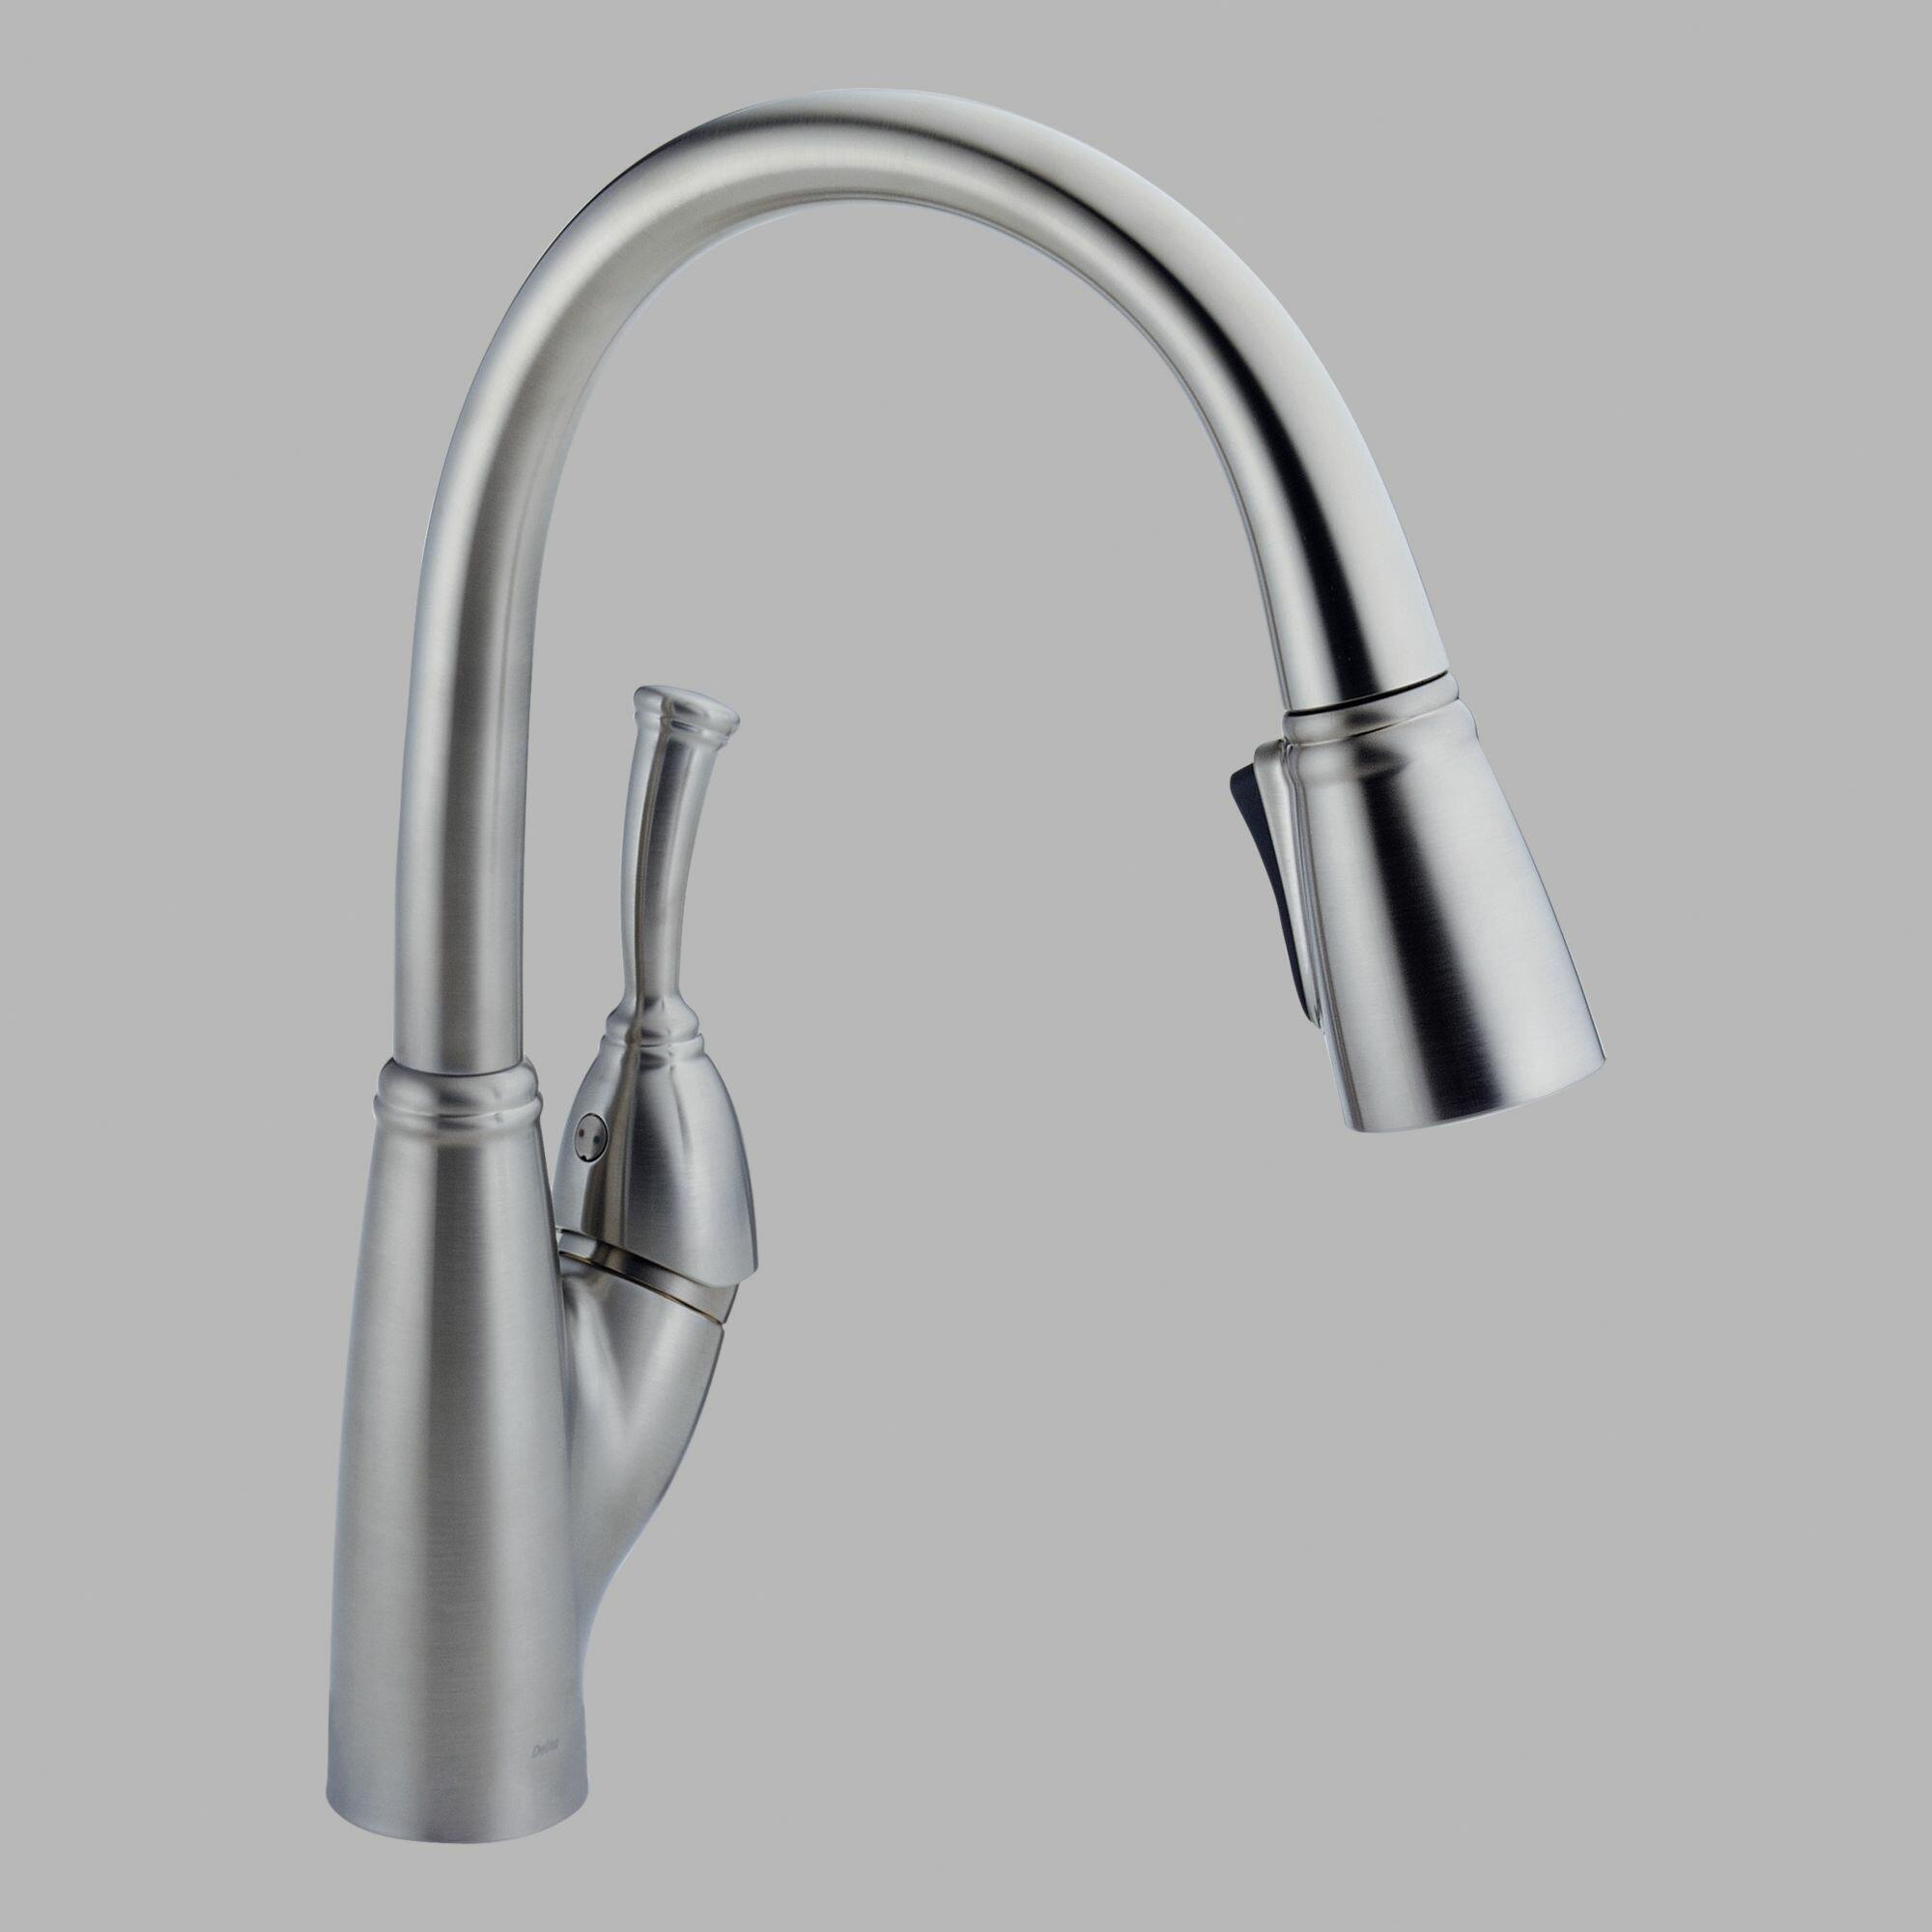 delta allora single handle deck mounted kitchen faucet a 700 bn single handle pull out kitchen faucet allora